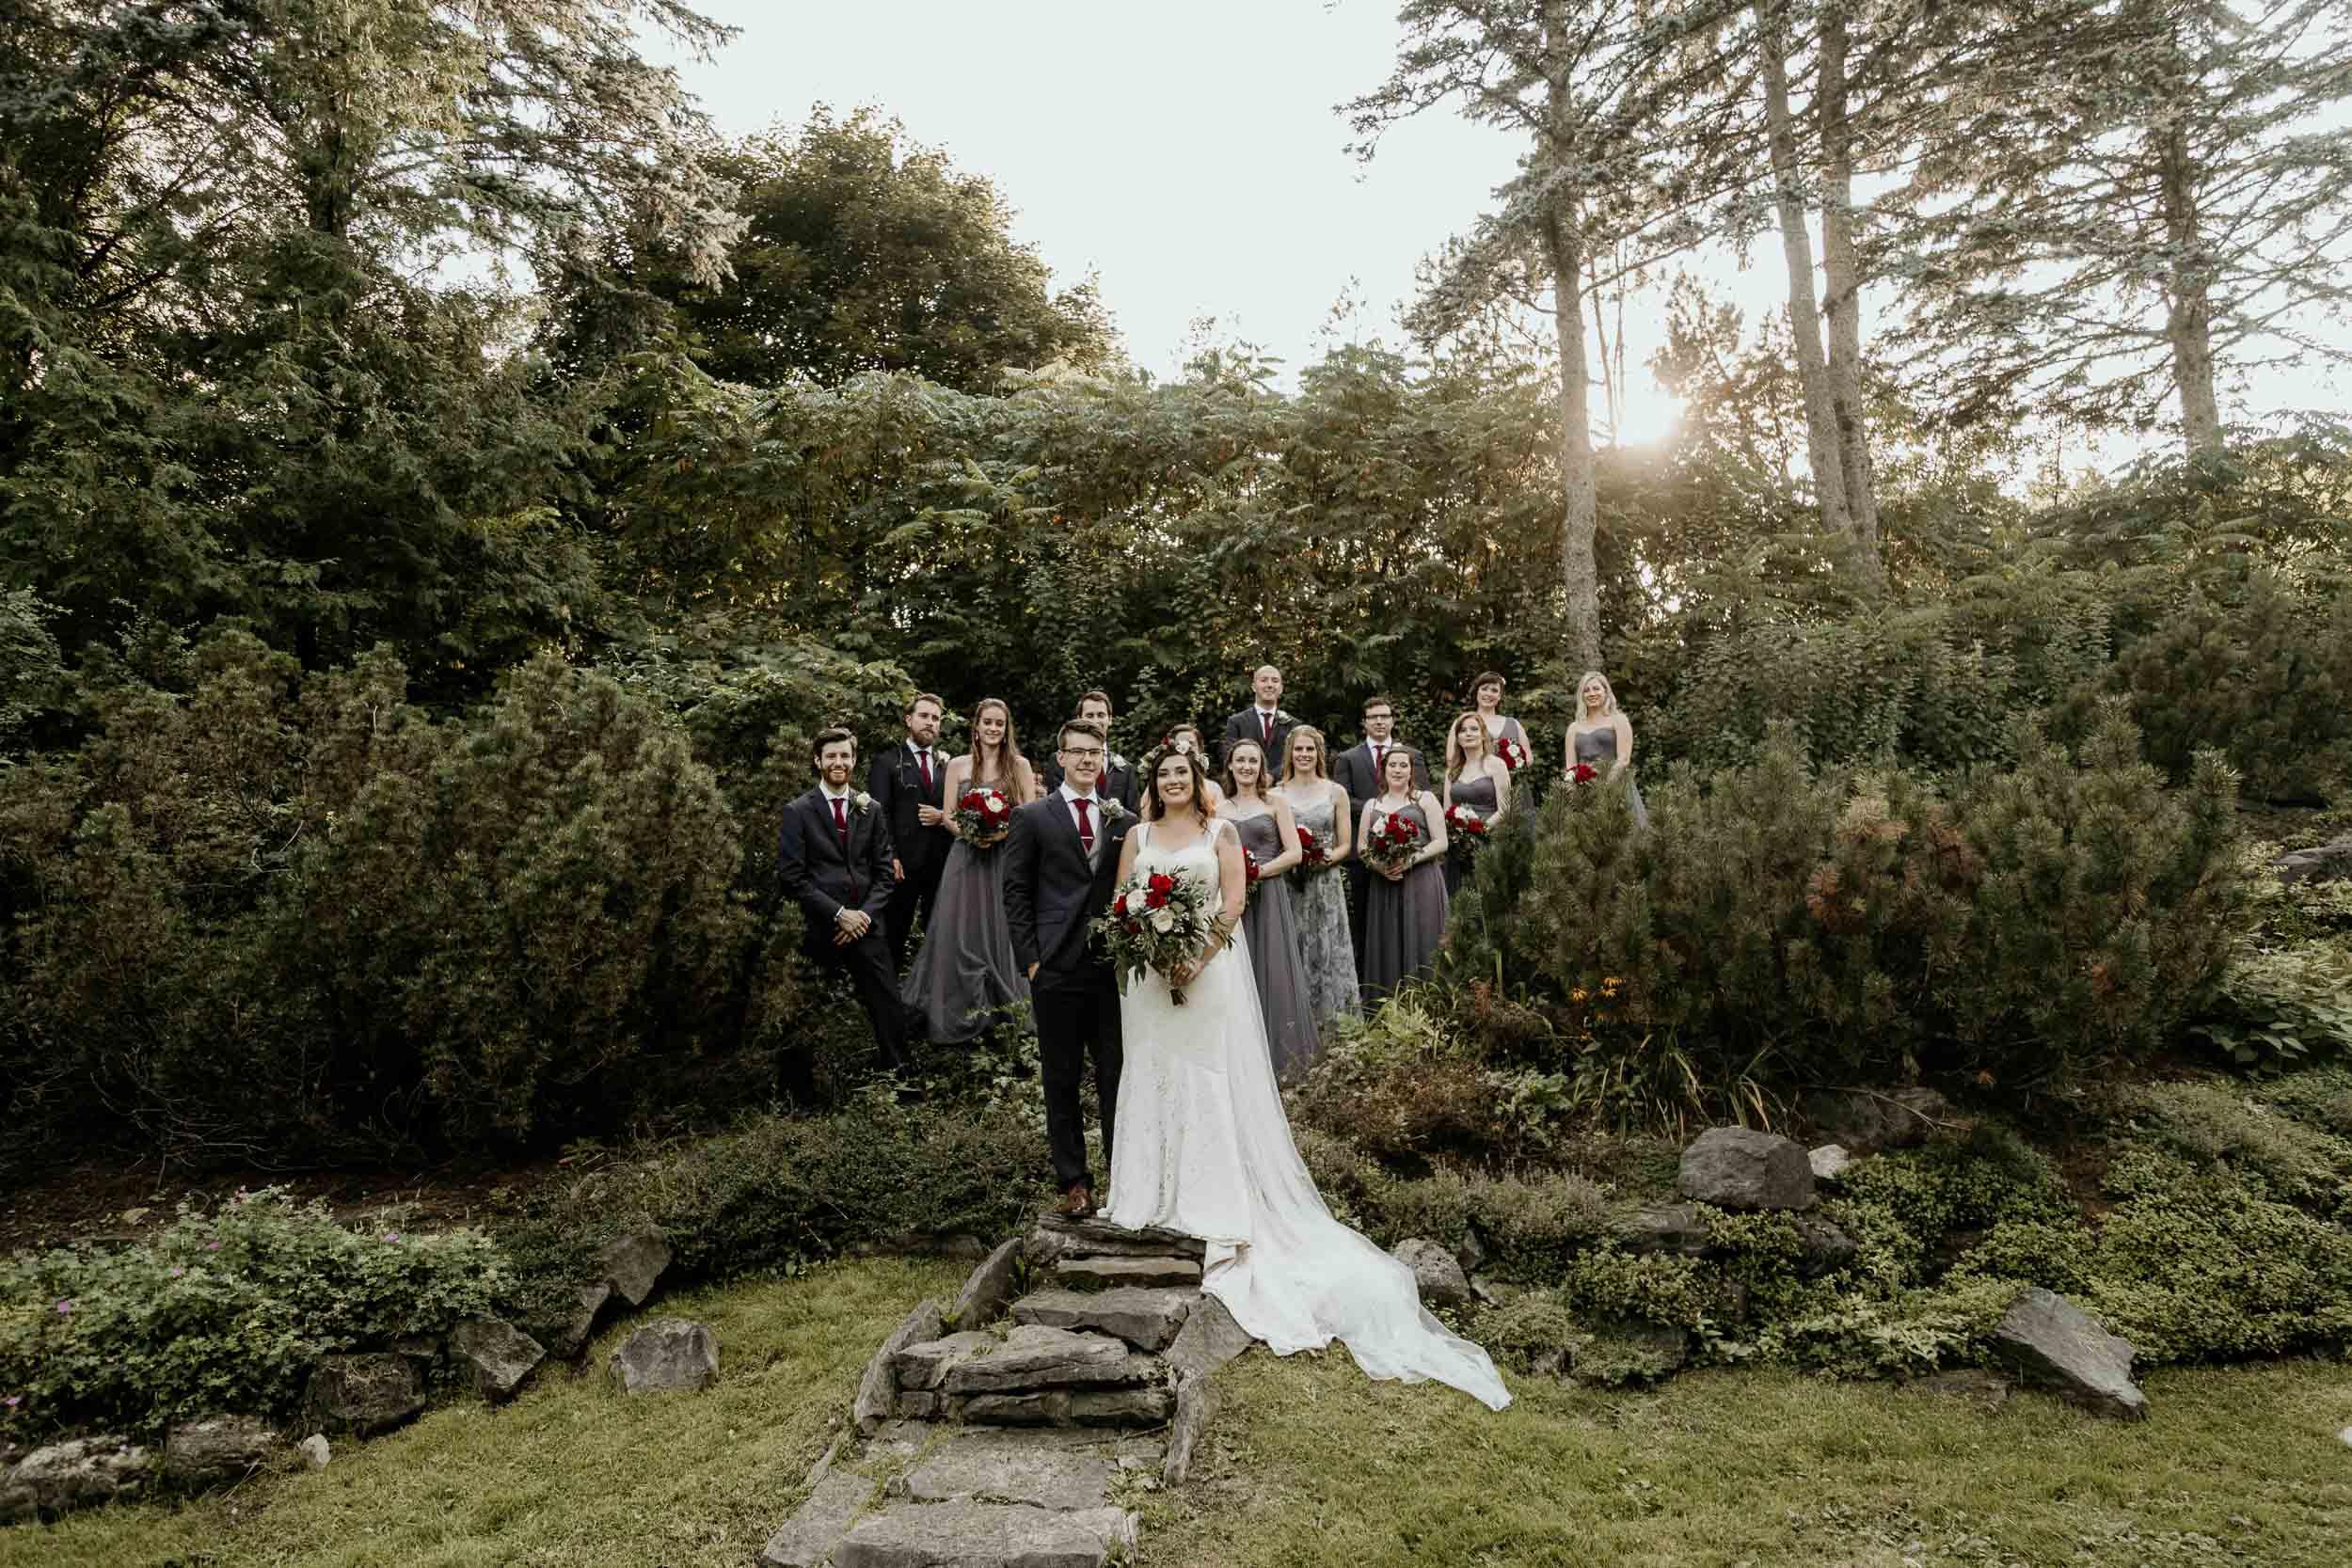 intimate-wedding-elopement-photographer-ottawa-toronto-7501.jpg